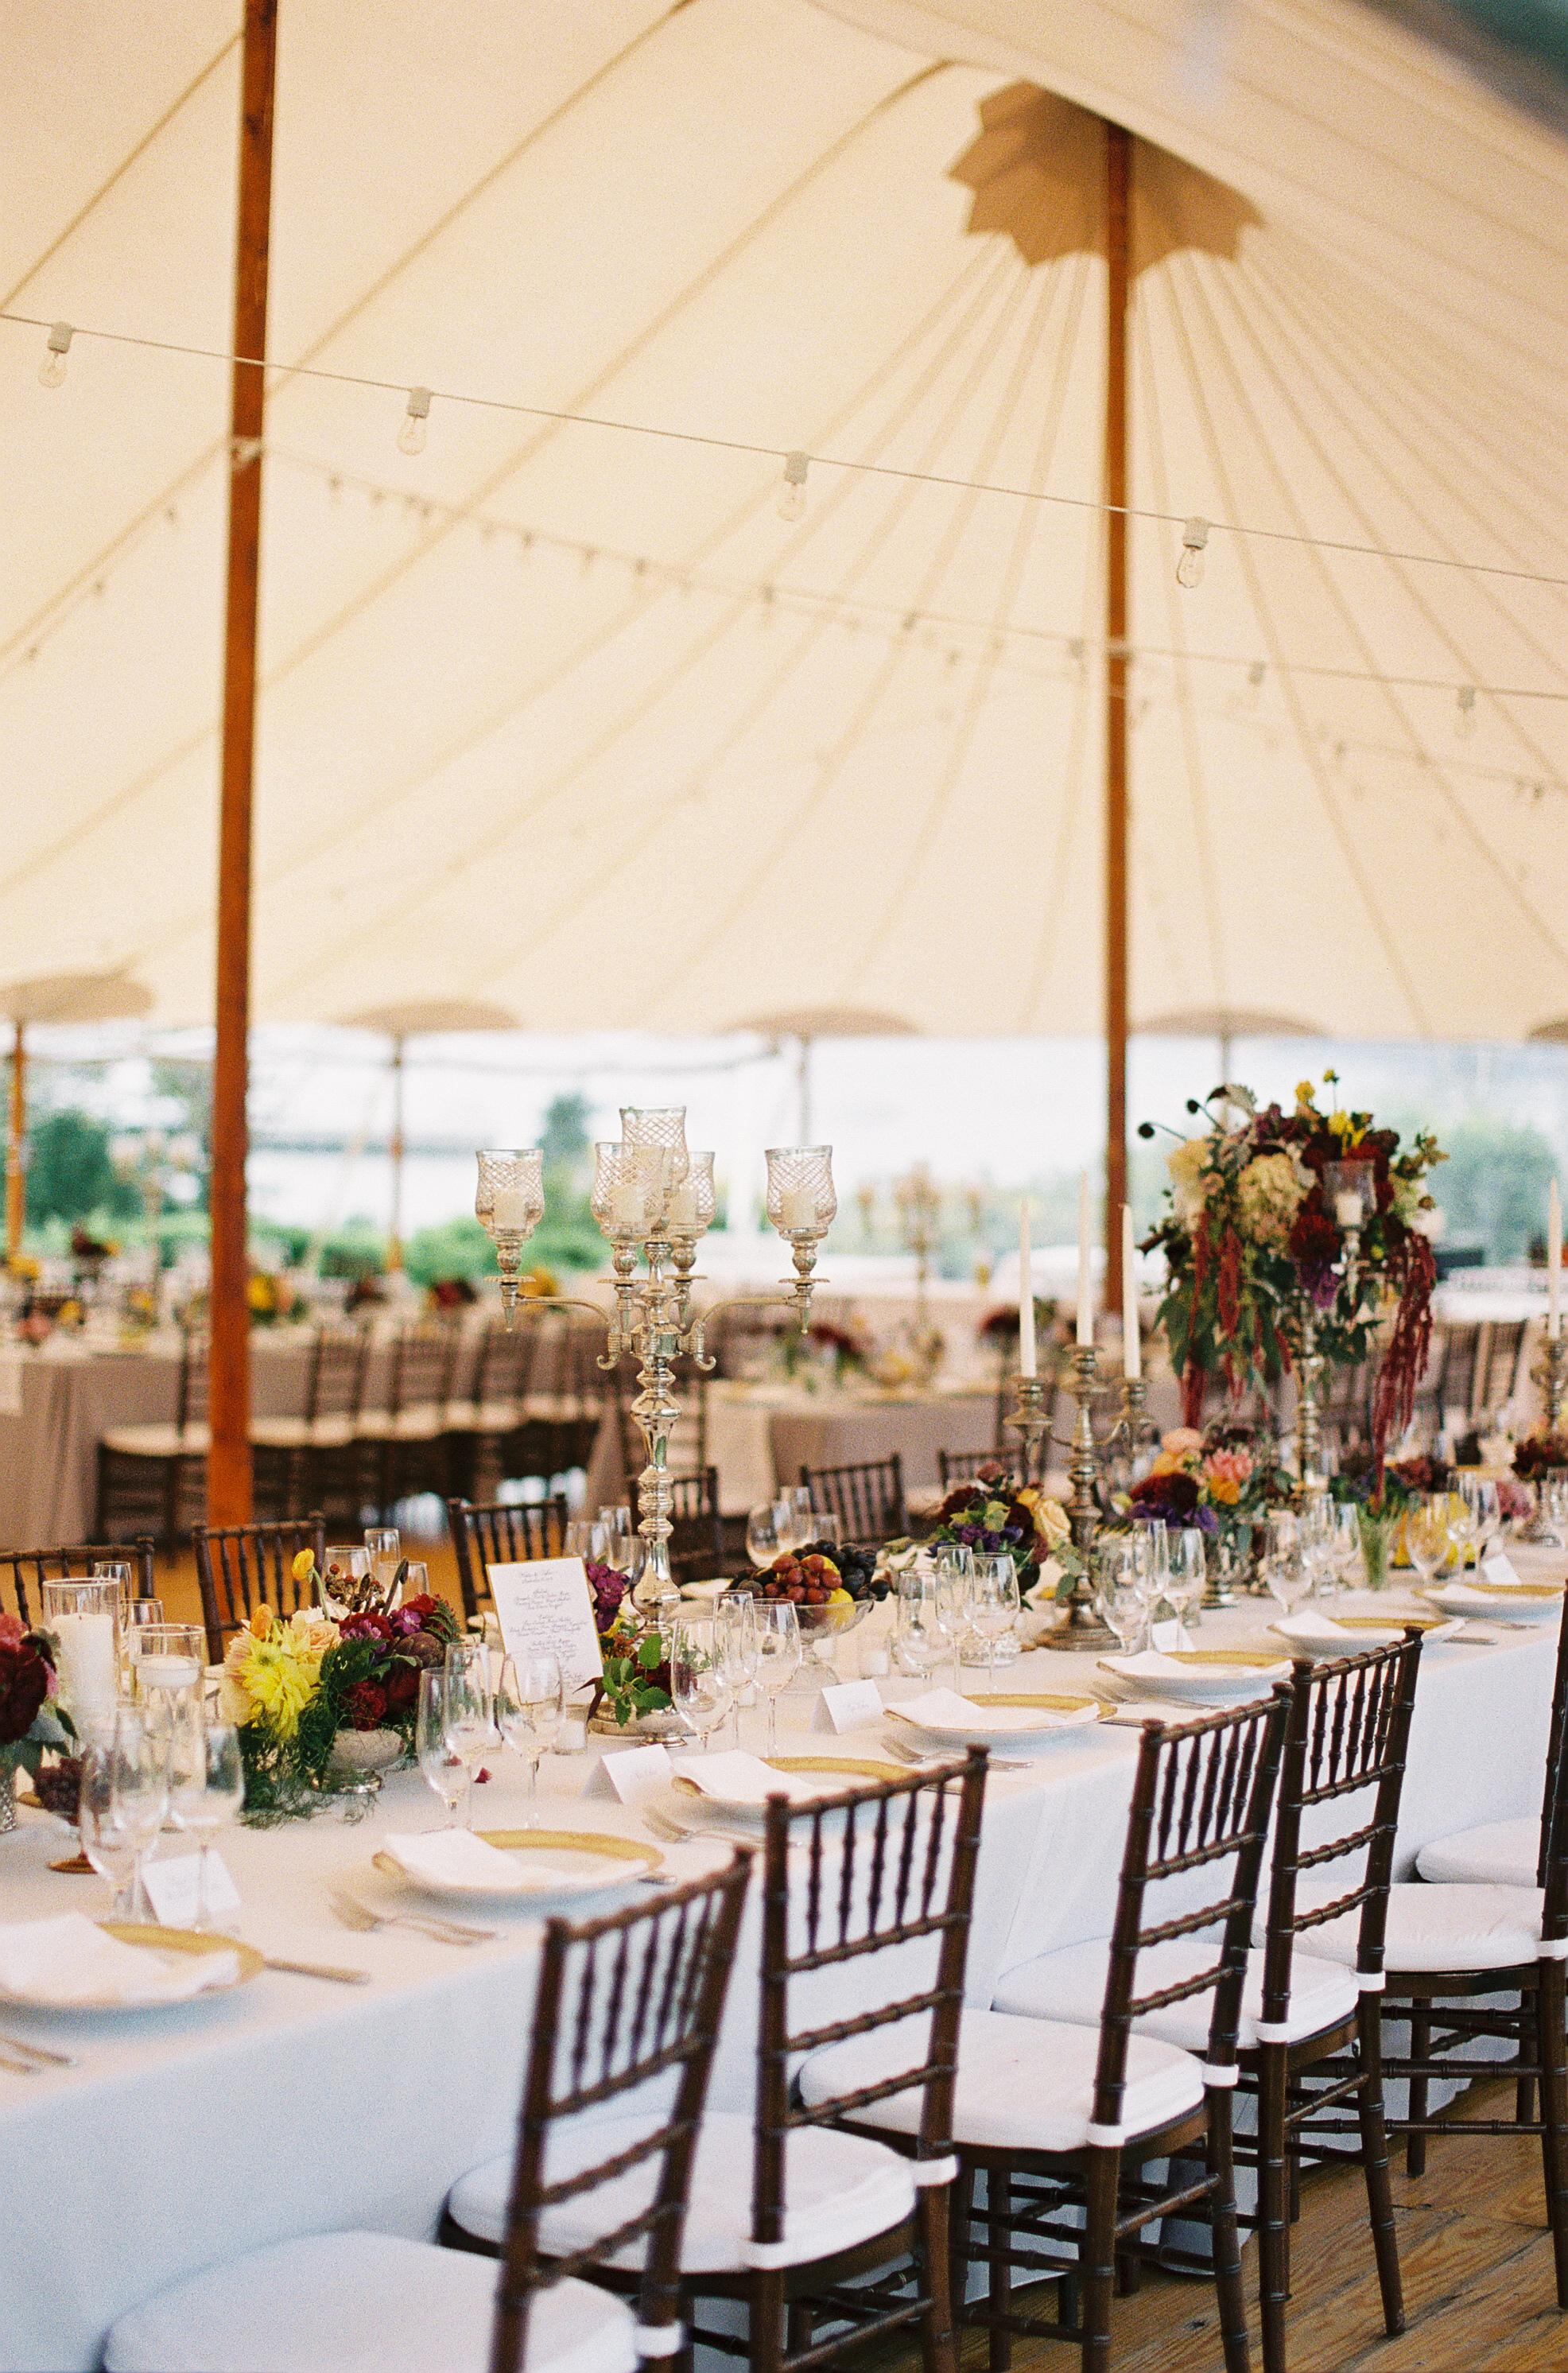 chebeague_island_inn_wedding_gabe_aceves029.JPG